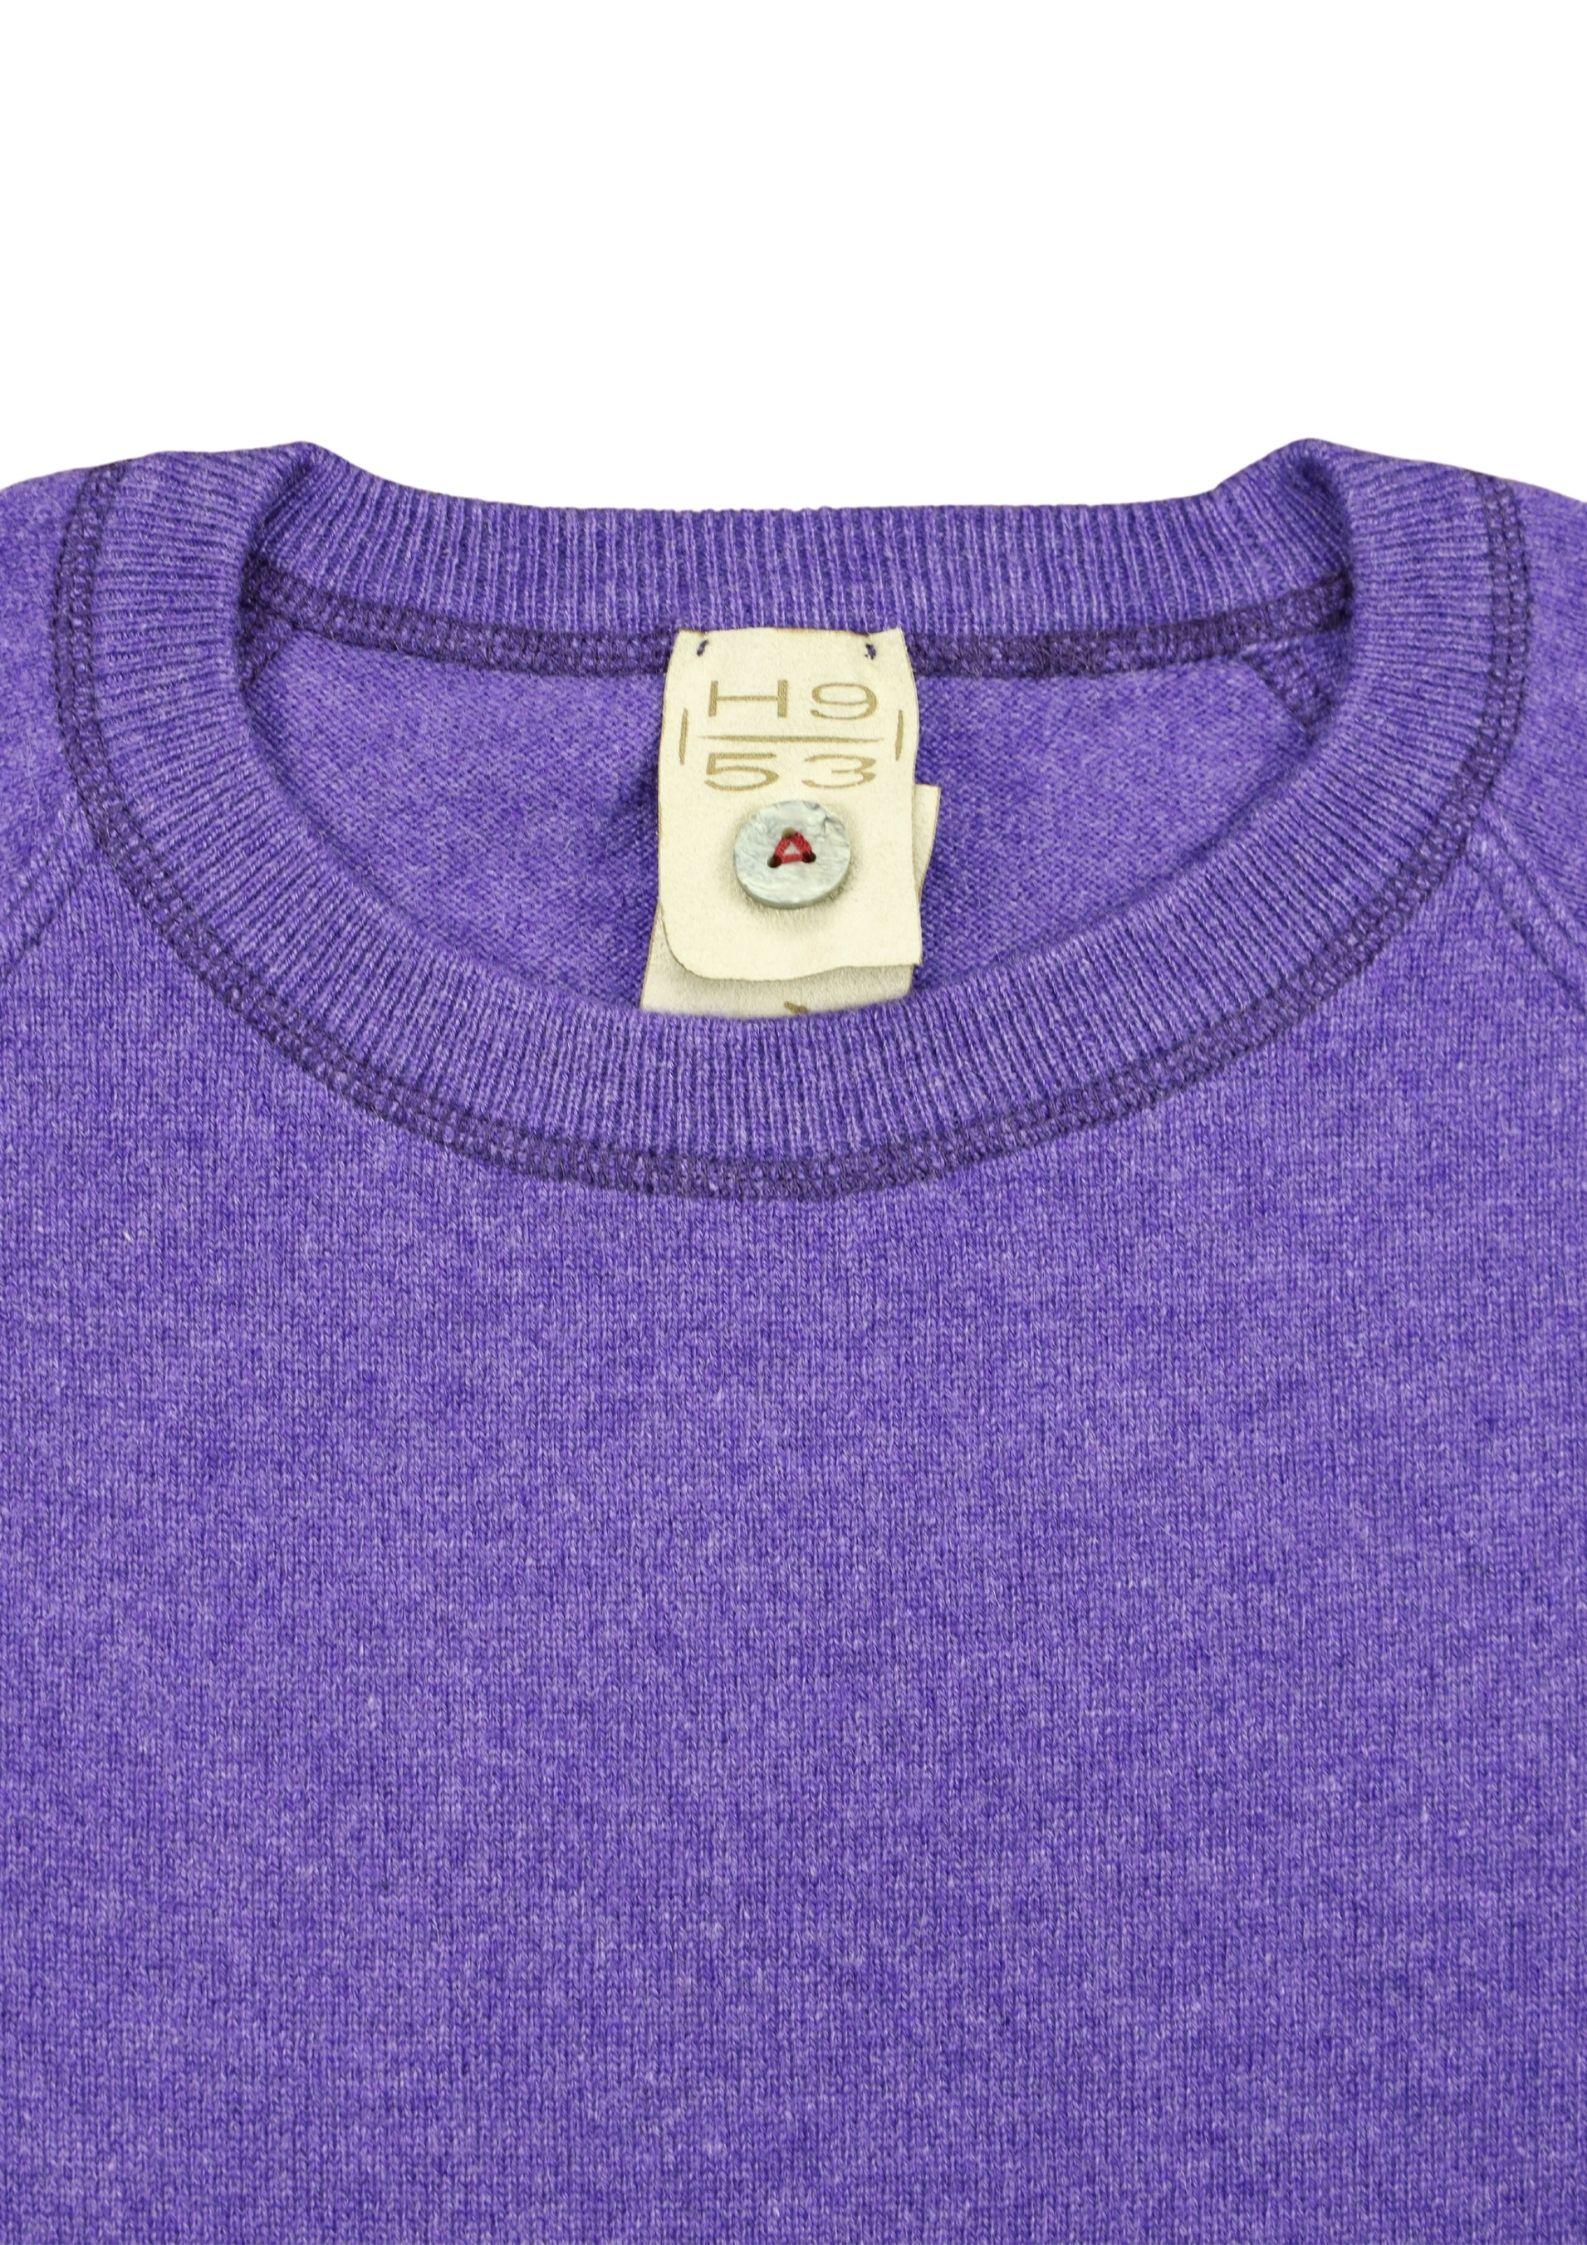 2  PLY CASHMERE SWEATERSWEAT STYLE H953 | Knitwear | 299664